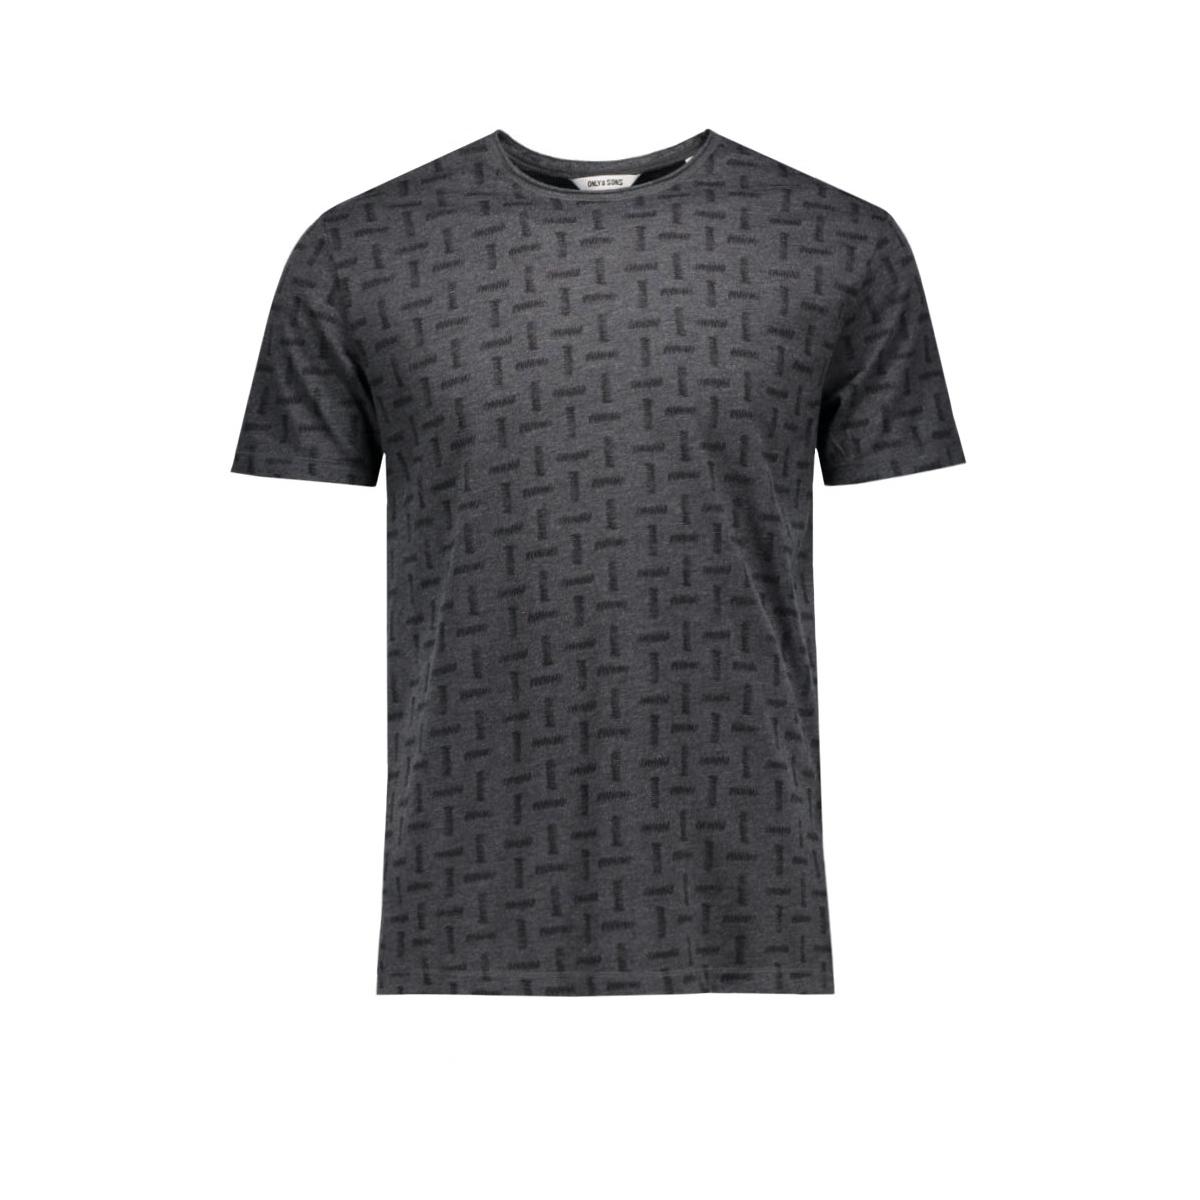 onskomma fitted aop tee 22004290 only & sons t-shirt dark grey melange